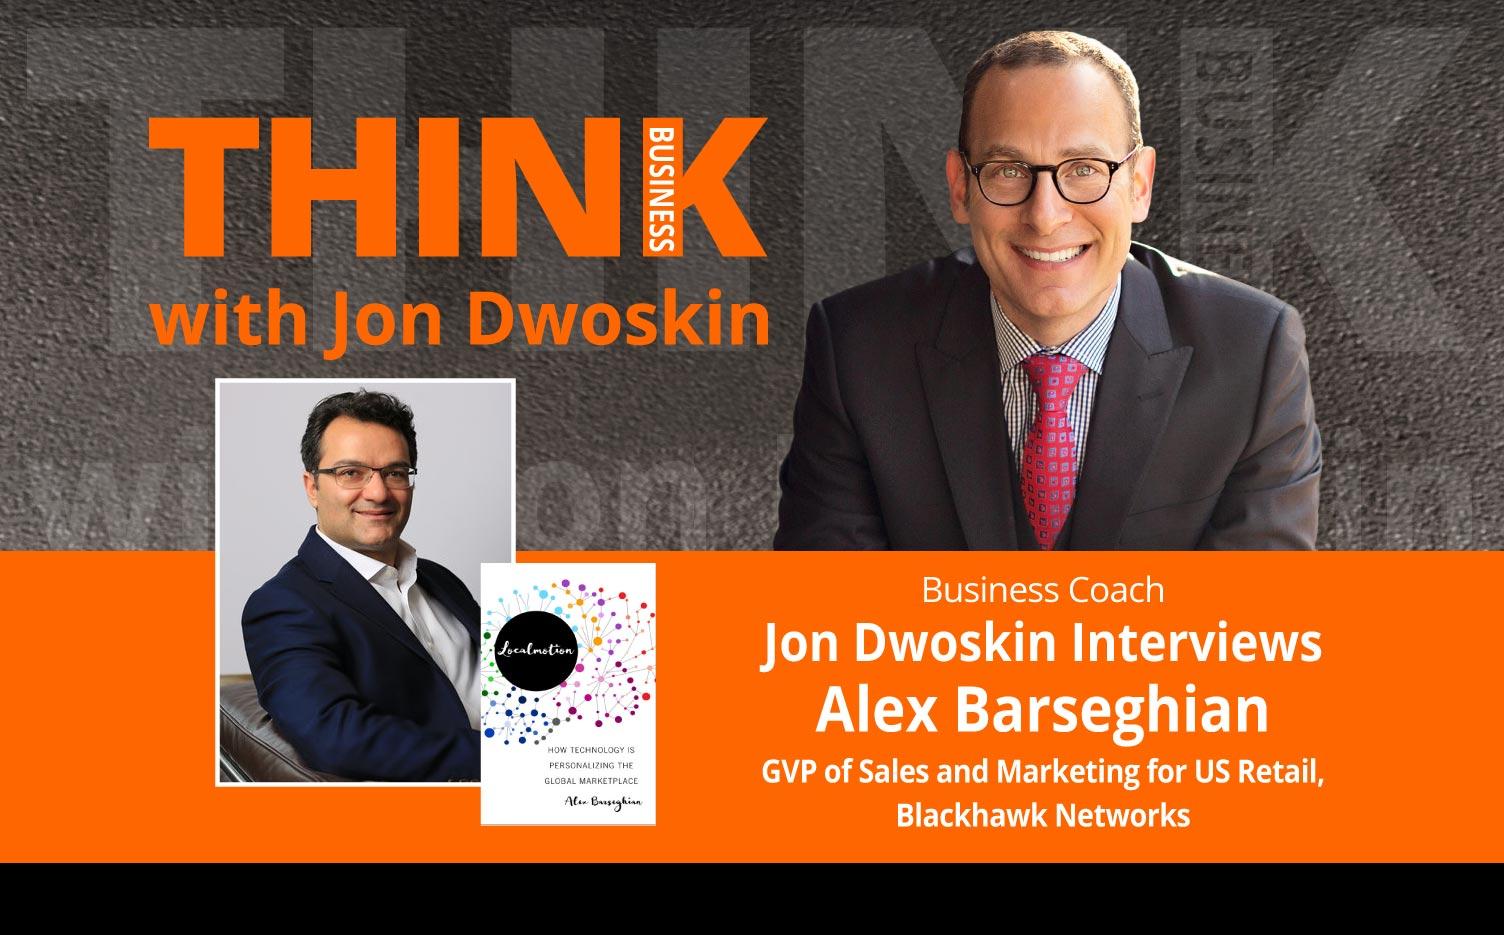 Jon Dwoskin Interviews Alex Barseghian, GVP of Sales and Marketing for US Retail, Blackhawk Networks